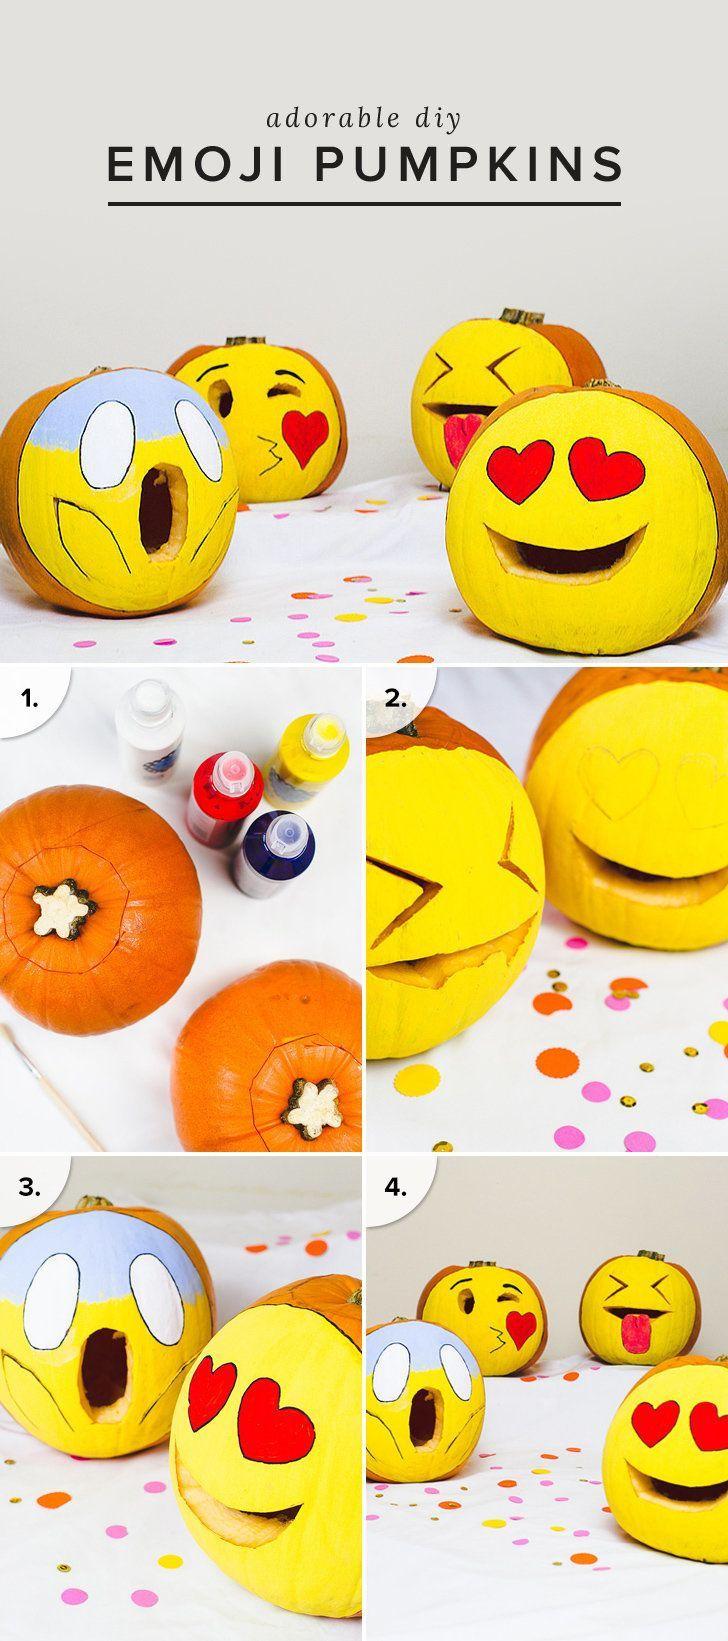 DIY your own Emoji Pumpkins this Halloween